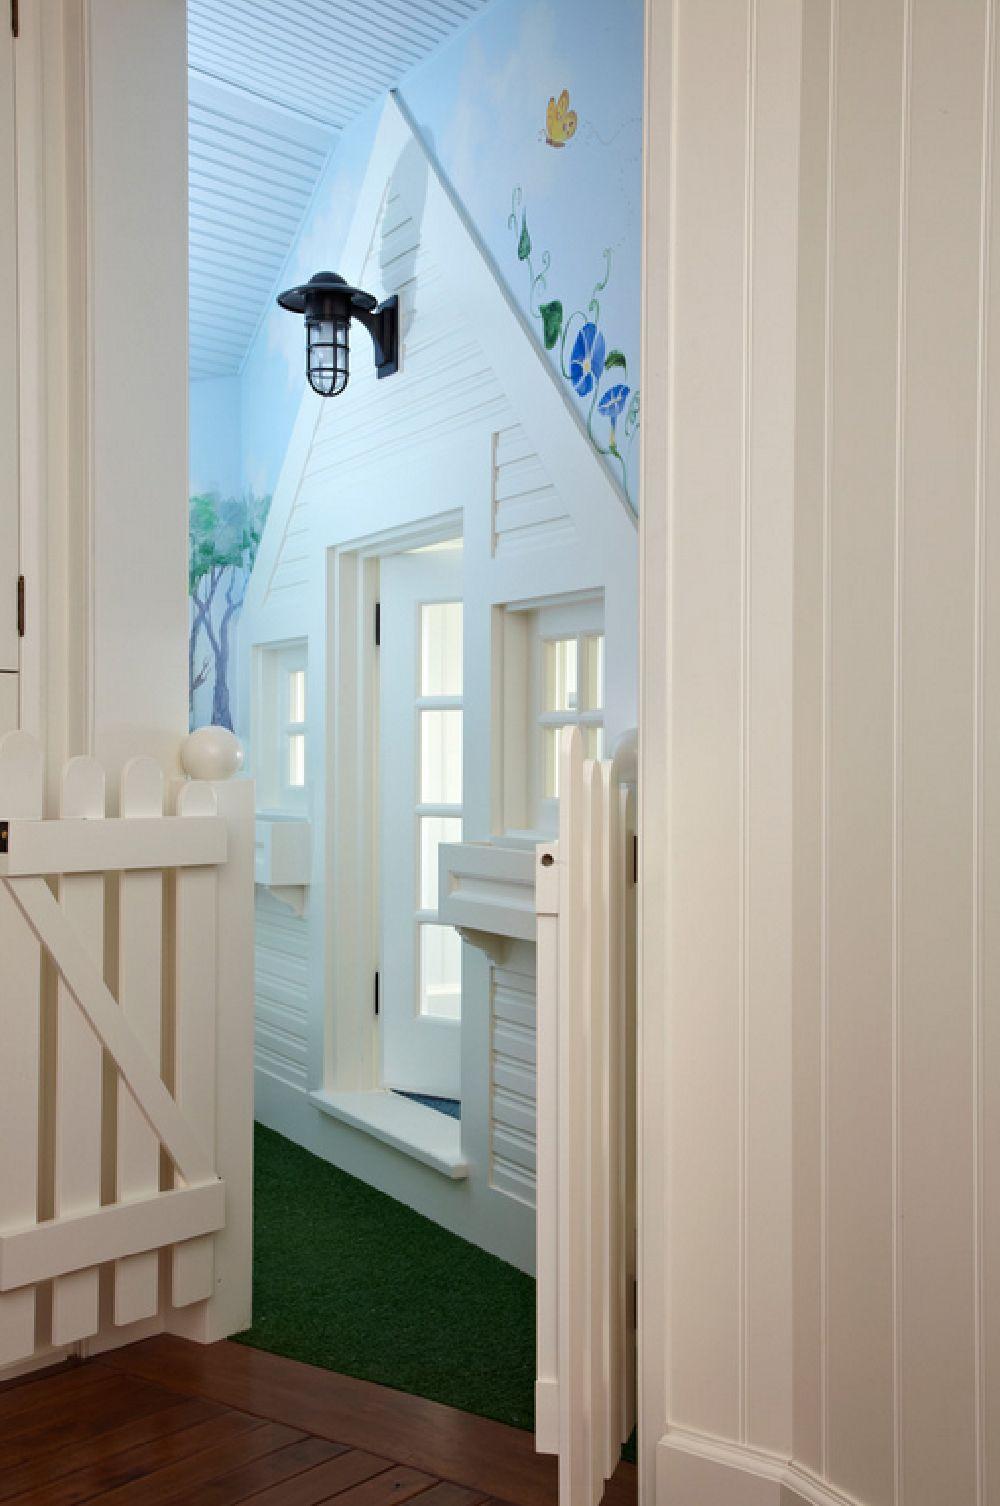 adelaparvu.com casa din lemn cu interior in nuante pastelate, casa SUA Michigan, design interior Tom Stringer, Foto Werner Straube (25)